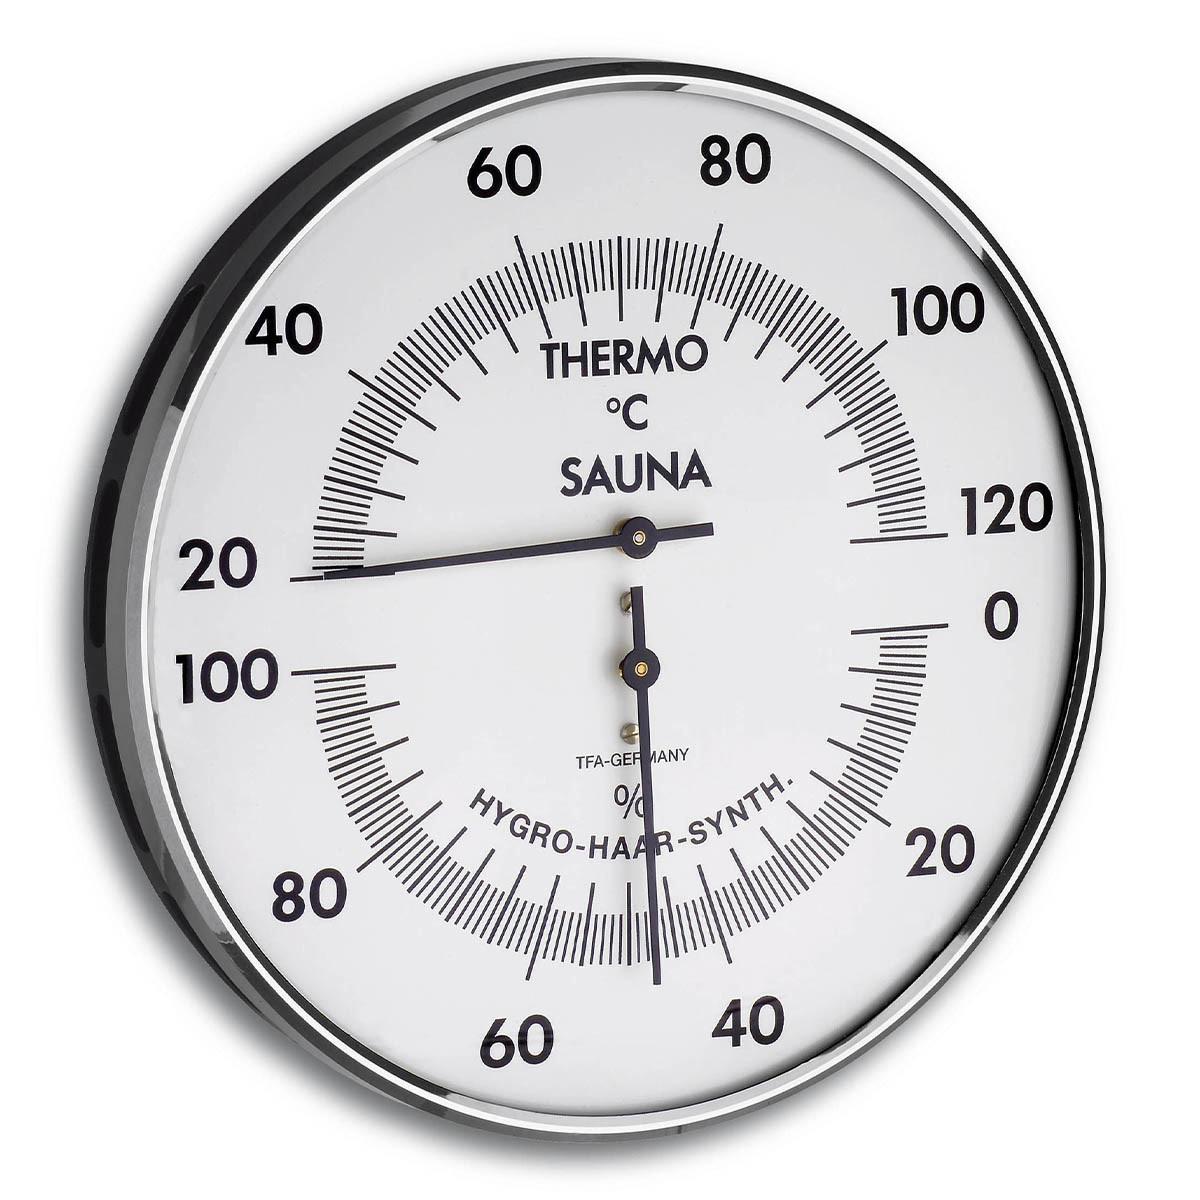 40-1032-analoges-sauna-thermo-hygrometer-mit-metallring-1200x1200px.jpg